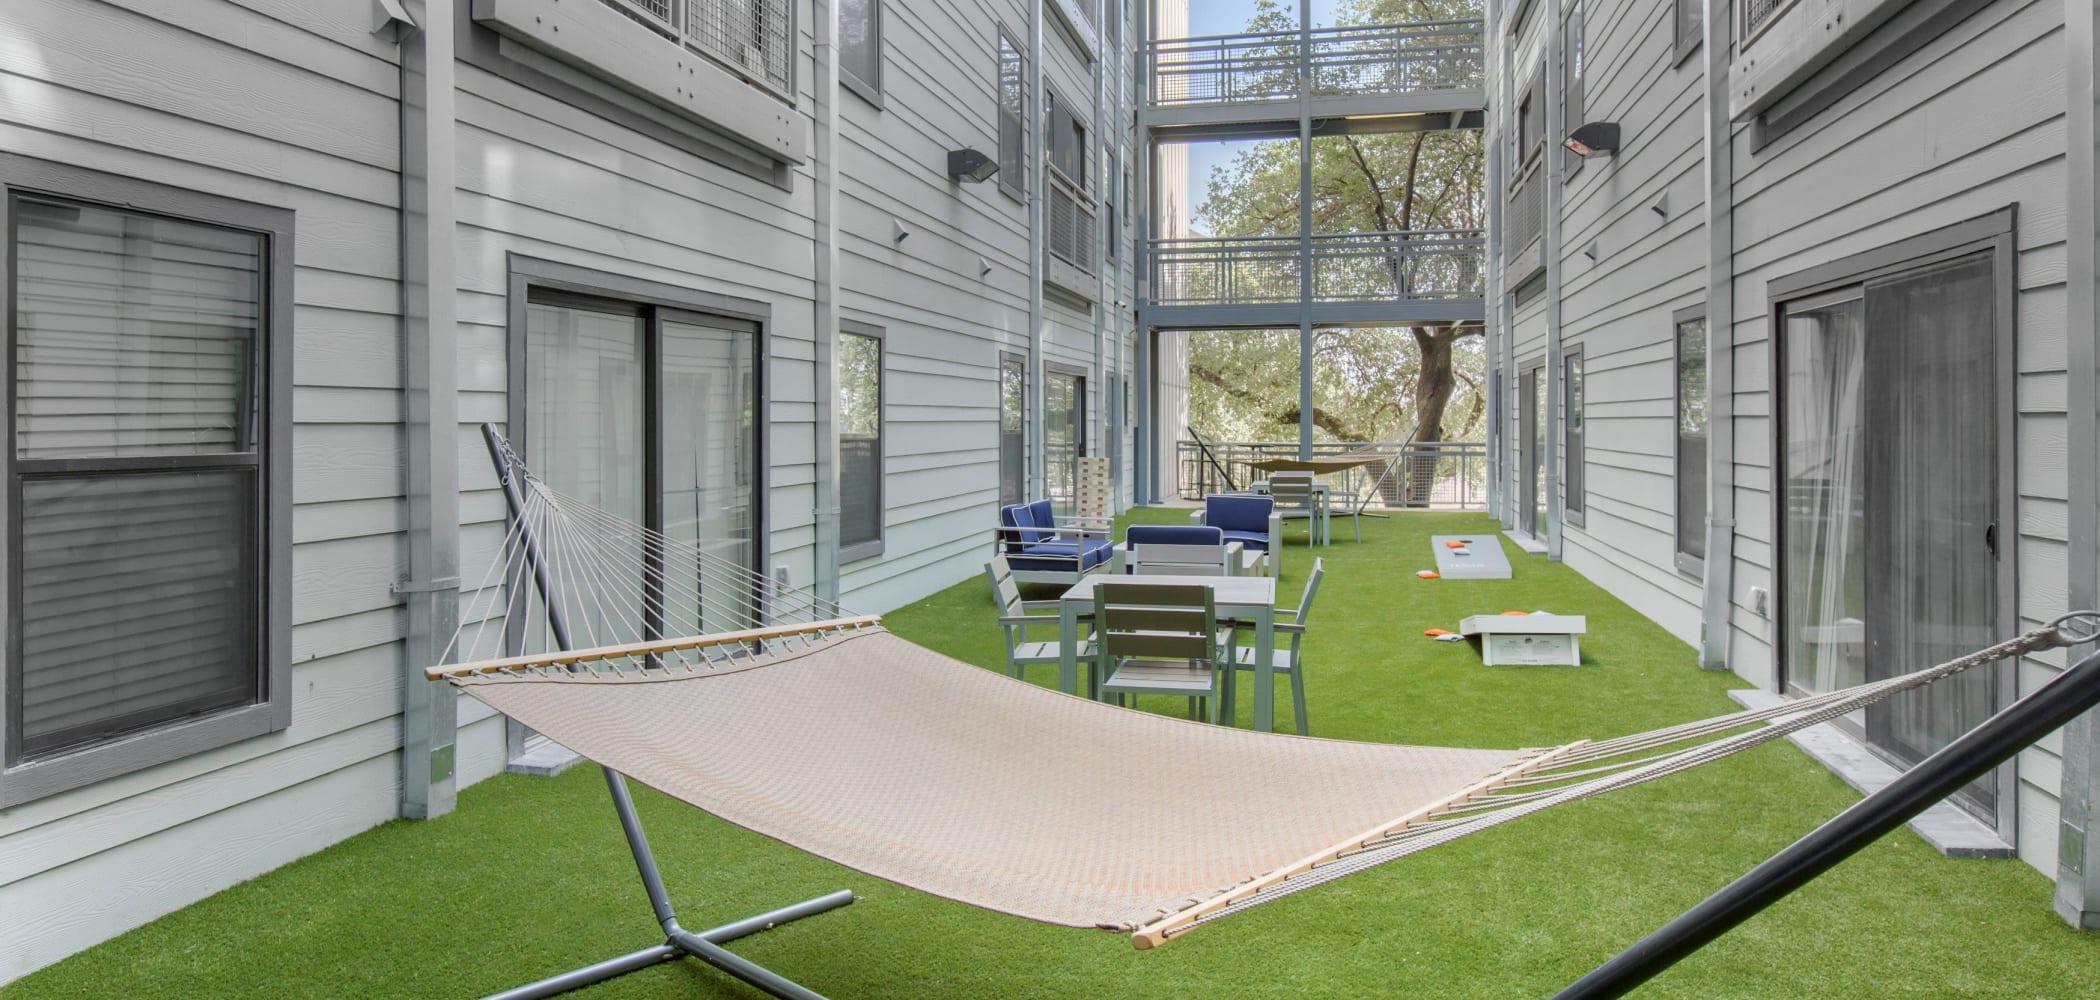 Hammock in Texan 26's courtyard in Austin, Texas